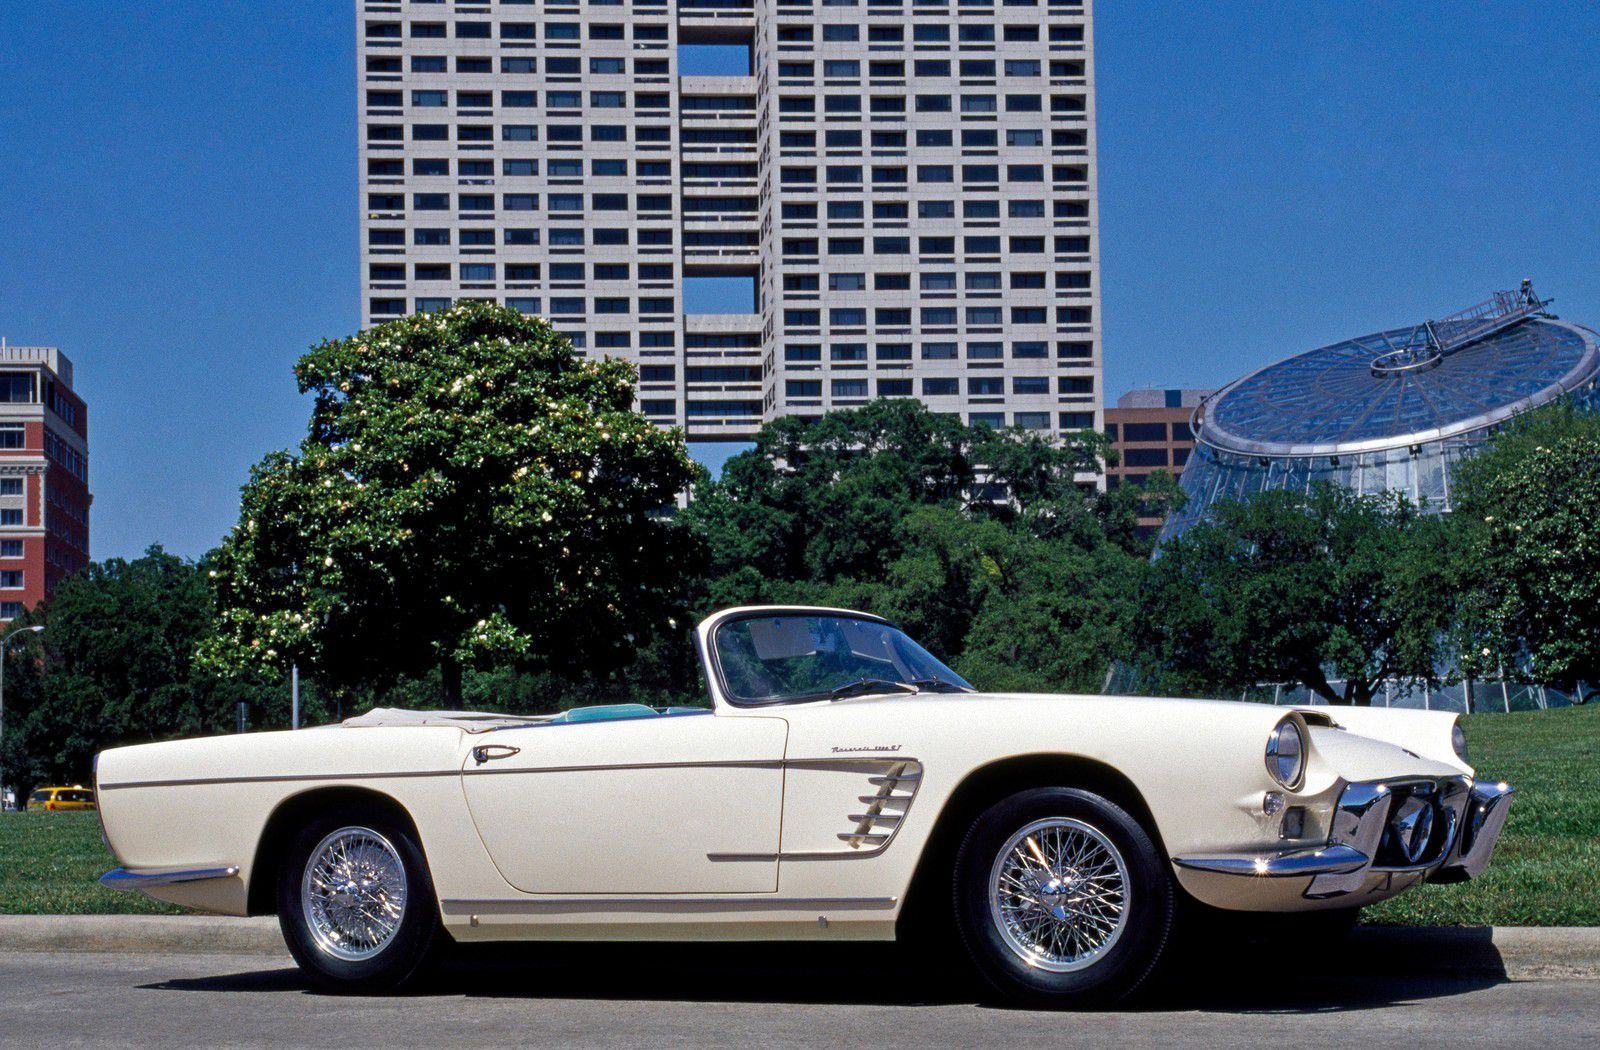 VOITURES DE LEGENDE (1201) : MASERATI  3500 GT FRUA SPYDER - 1959